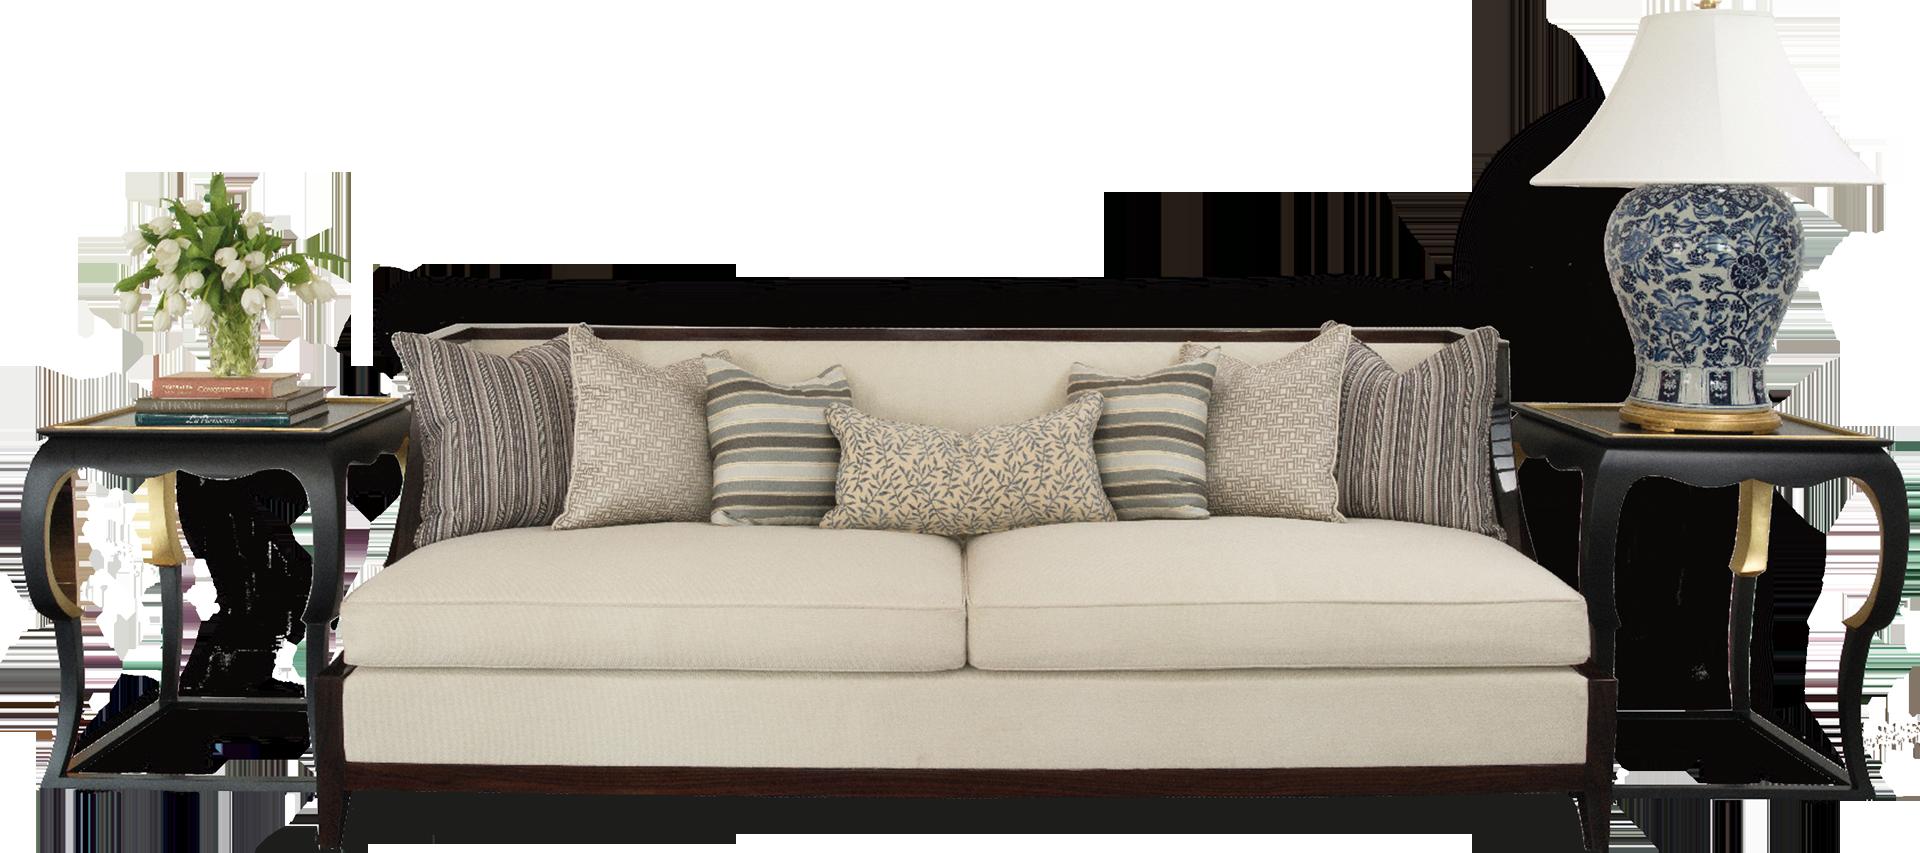 Furniture Wonderful Picture Images 20952 Transparentpng